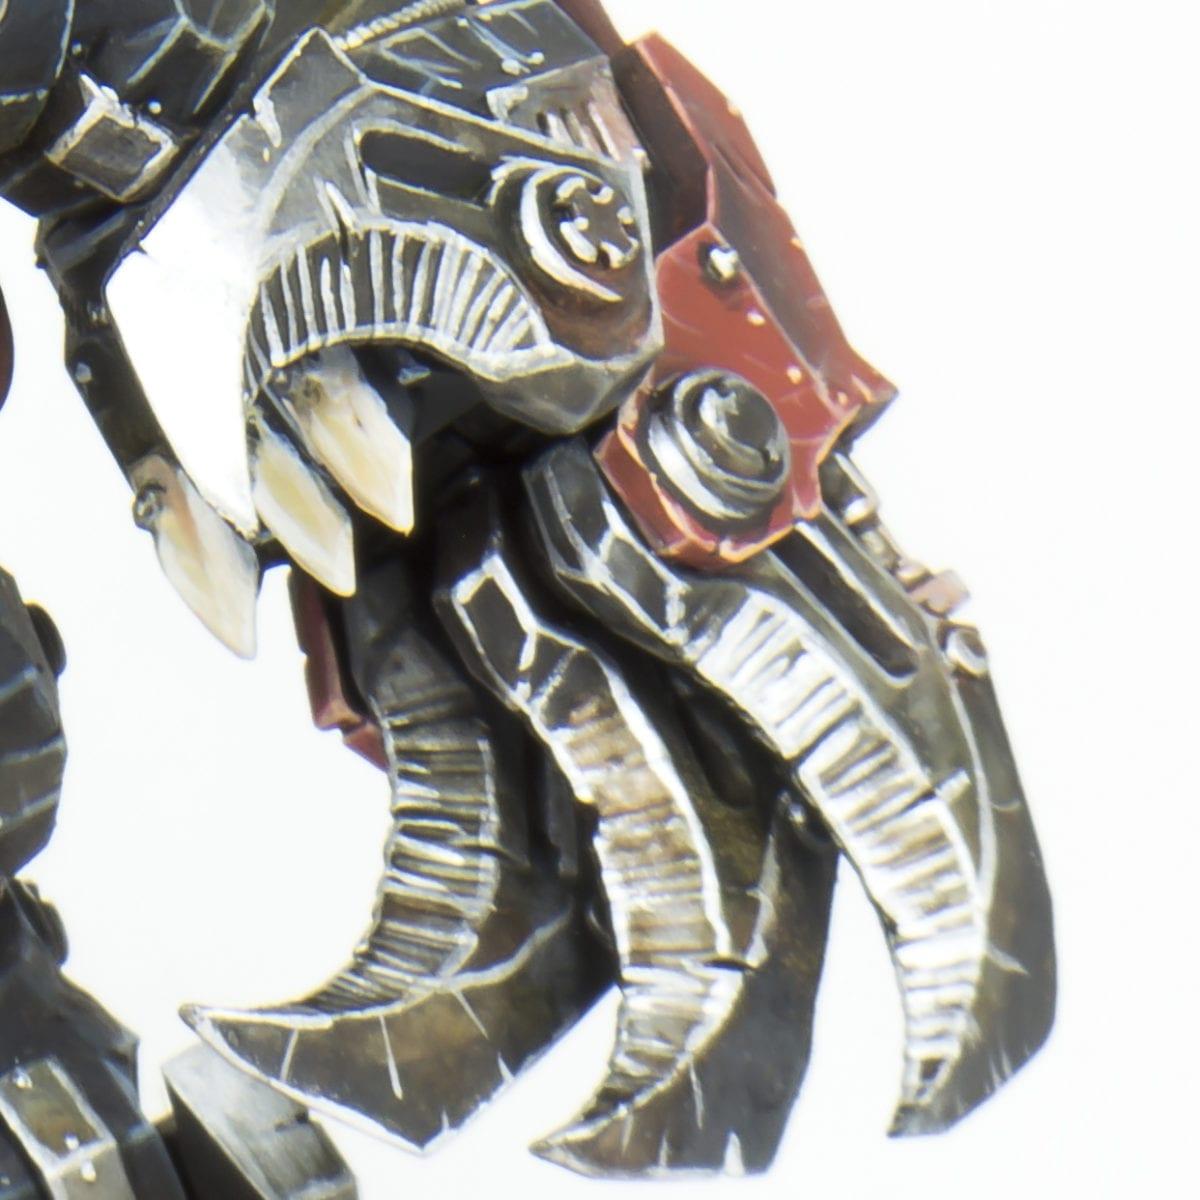 ghazghkull_metal